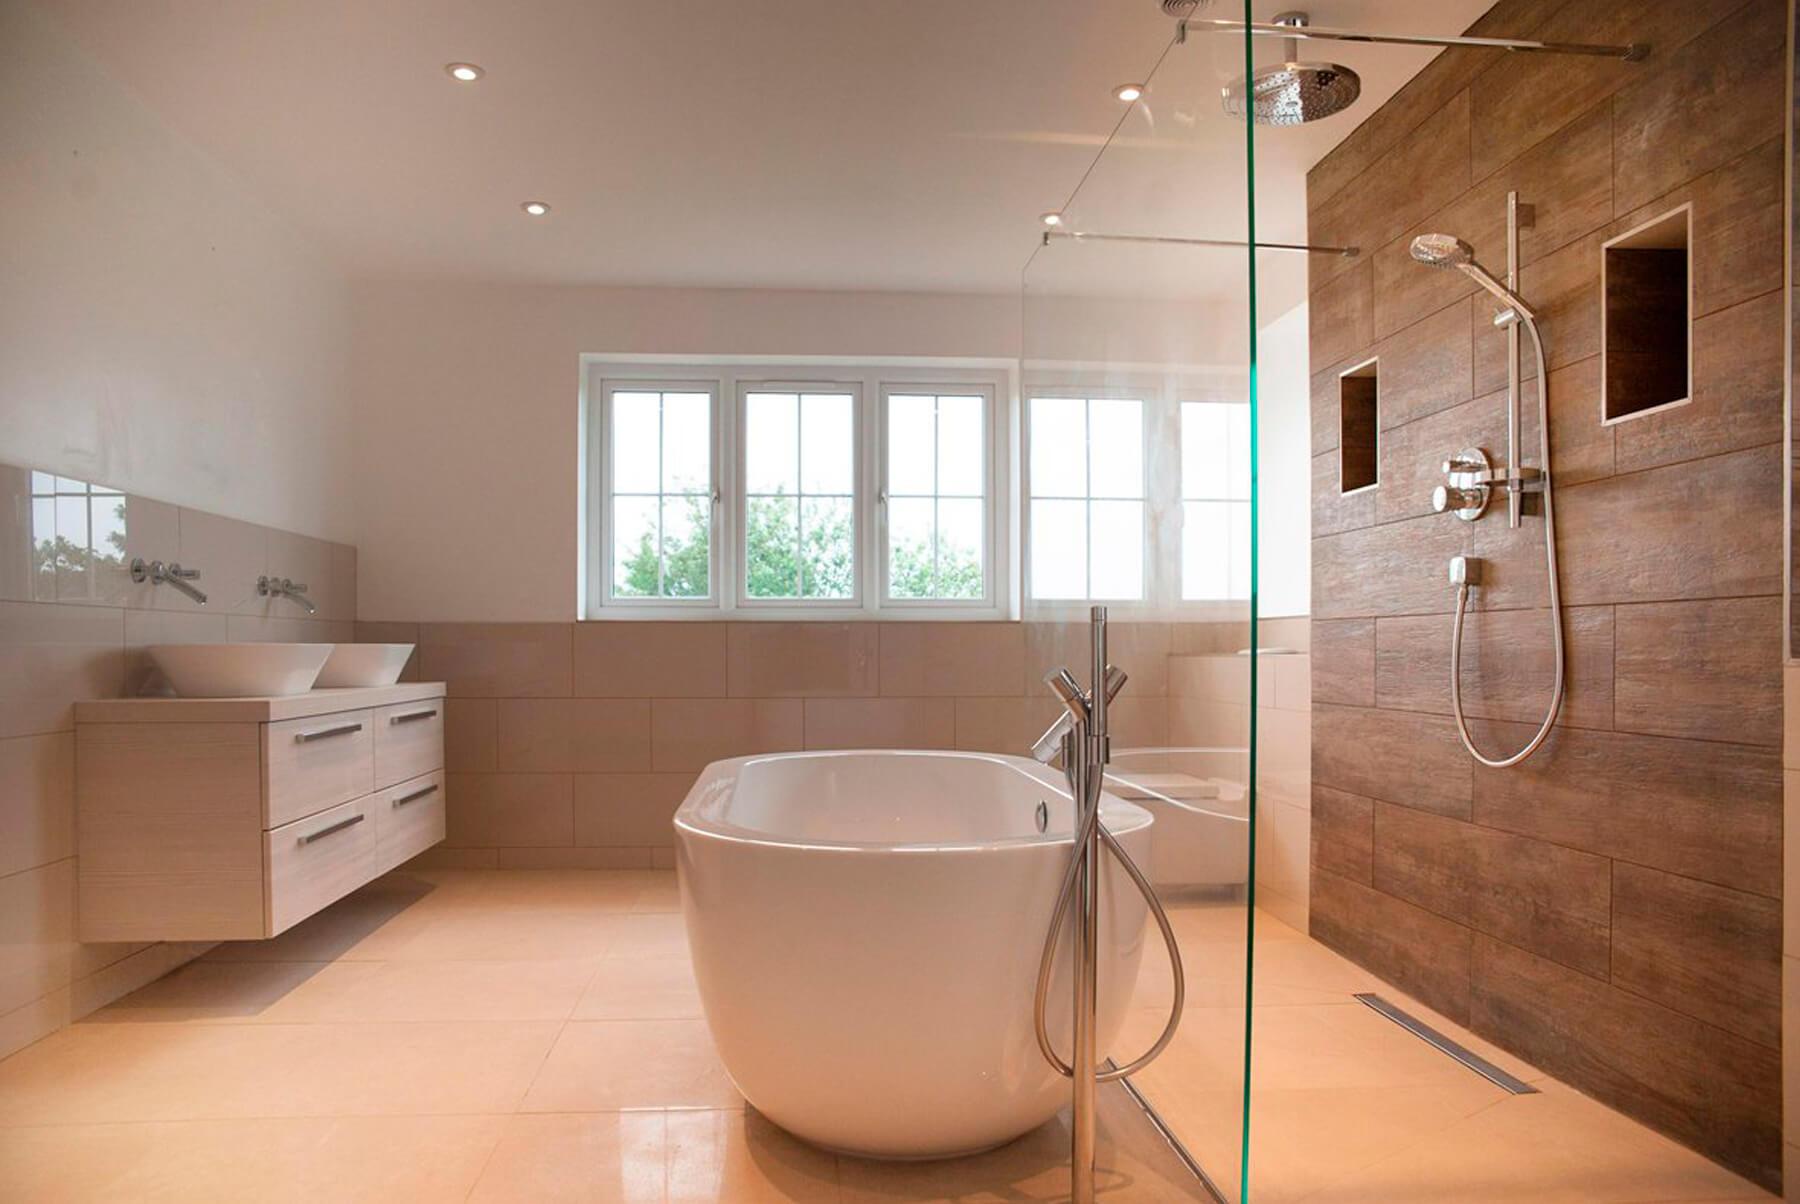 Bath-Tubs-OVALI-1800x1204